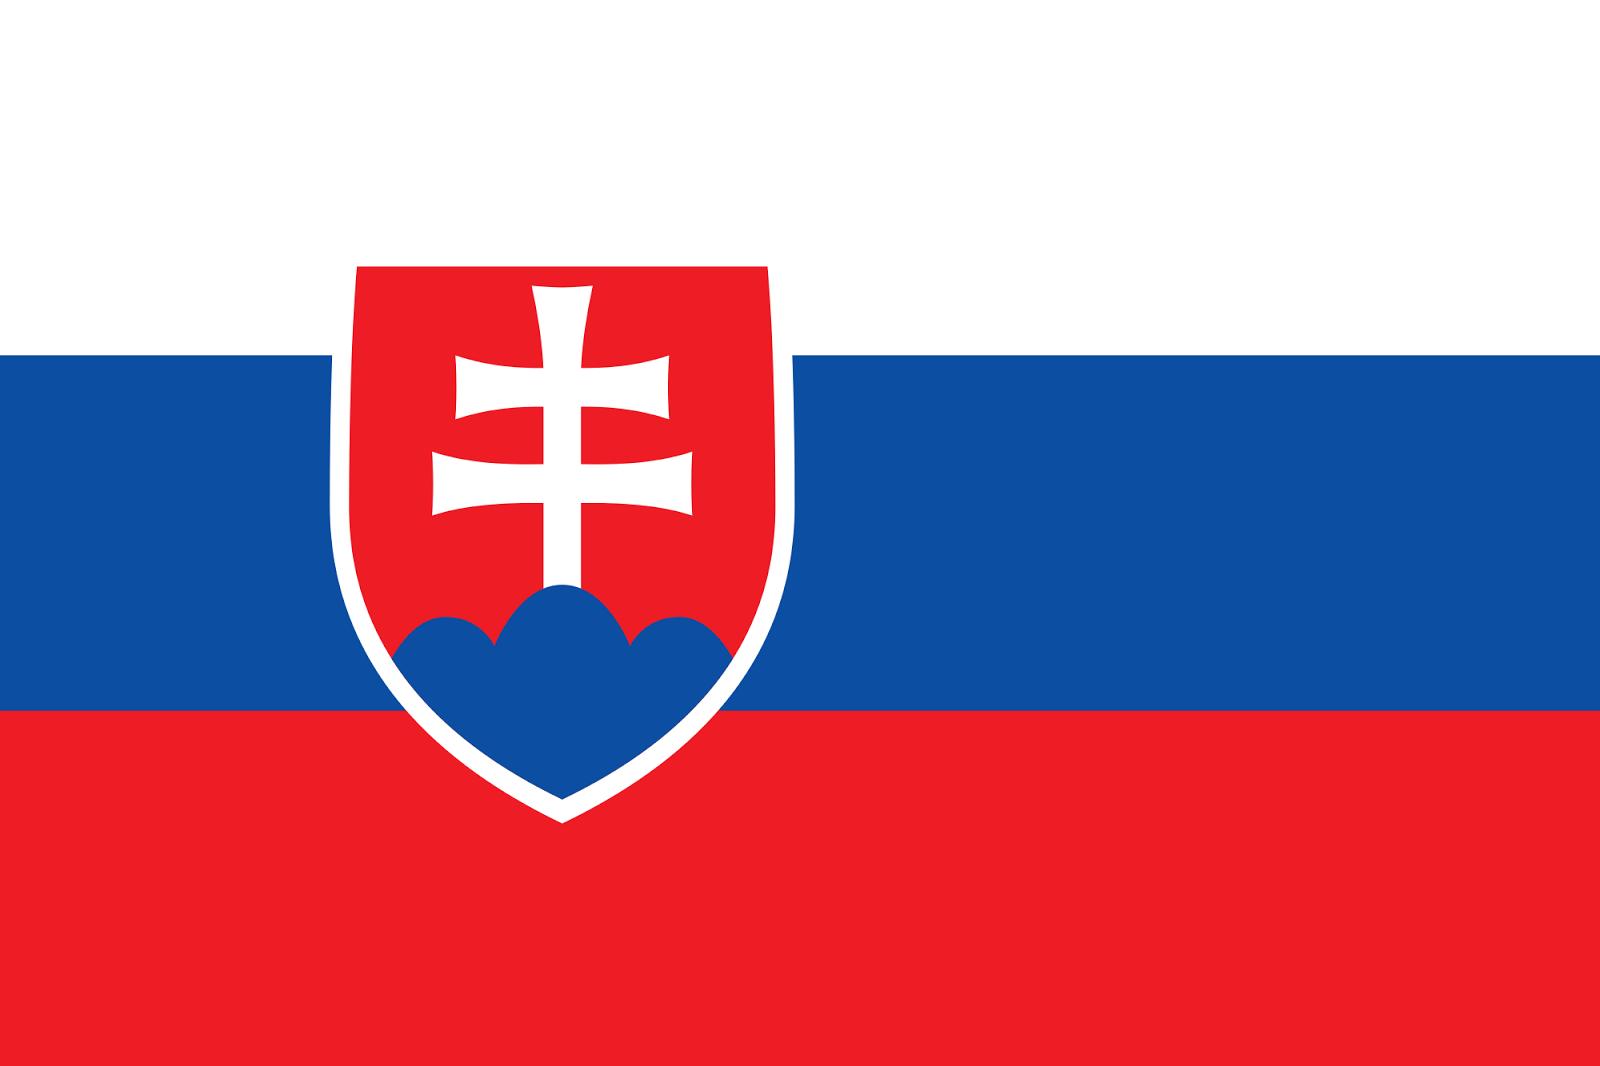 http://carbrandsincurrentproduction.blogspot.com.es/search/label/Slovakia